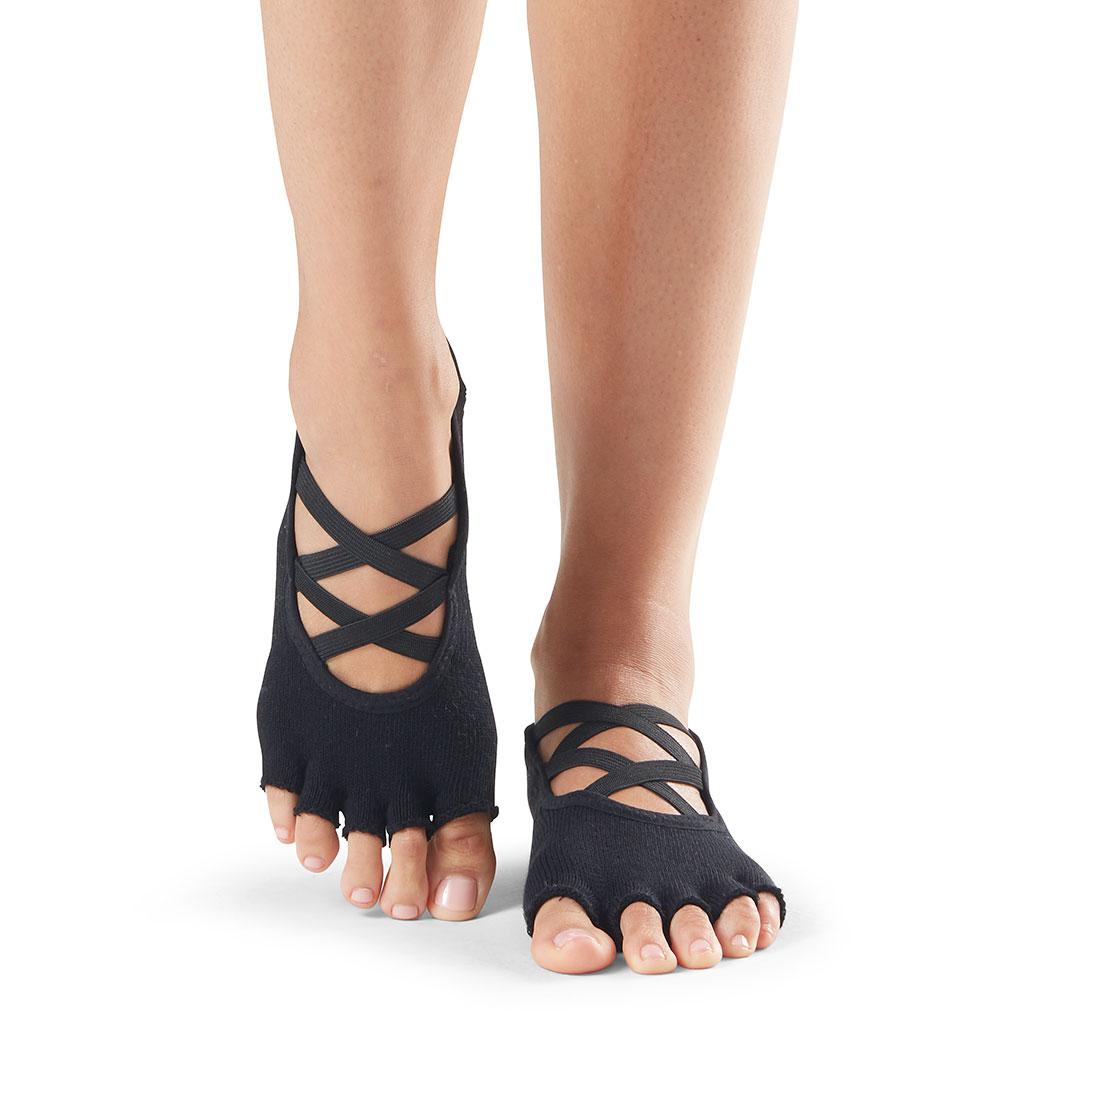 Yogasocken ToeSox Elle Half Toe Black - 1